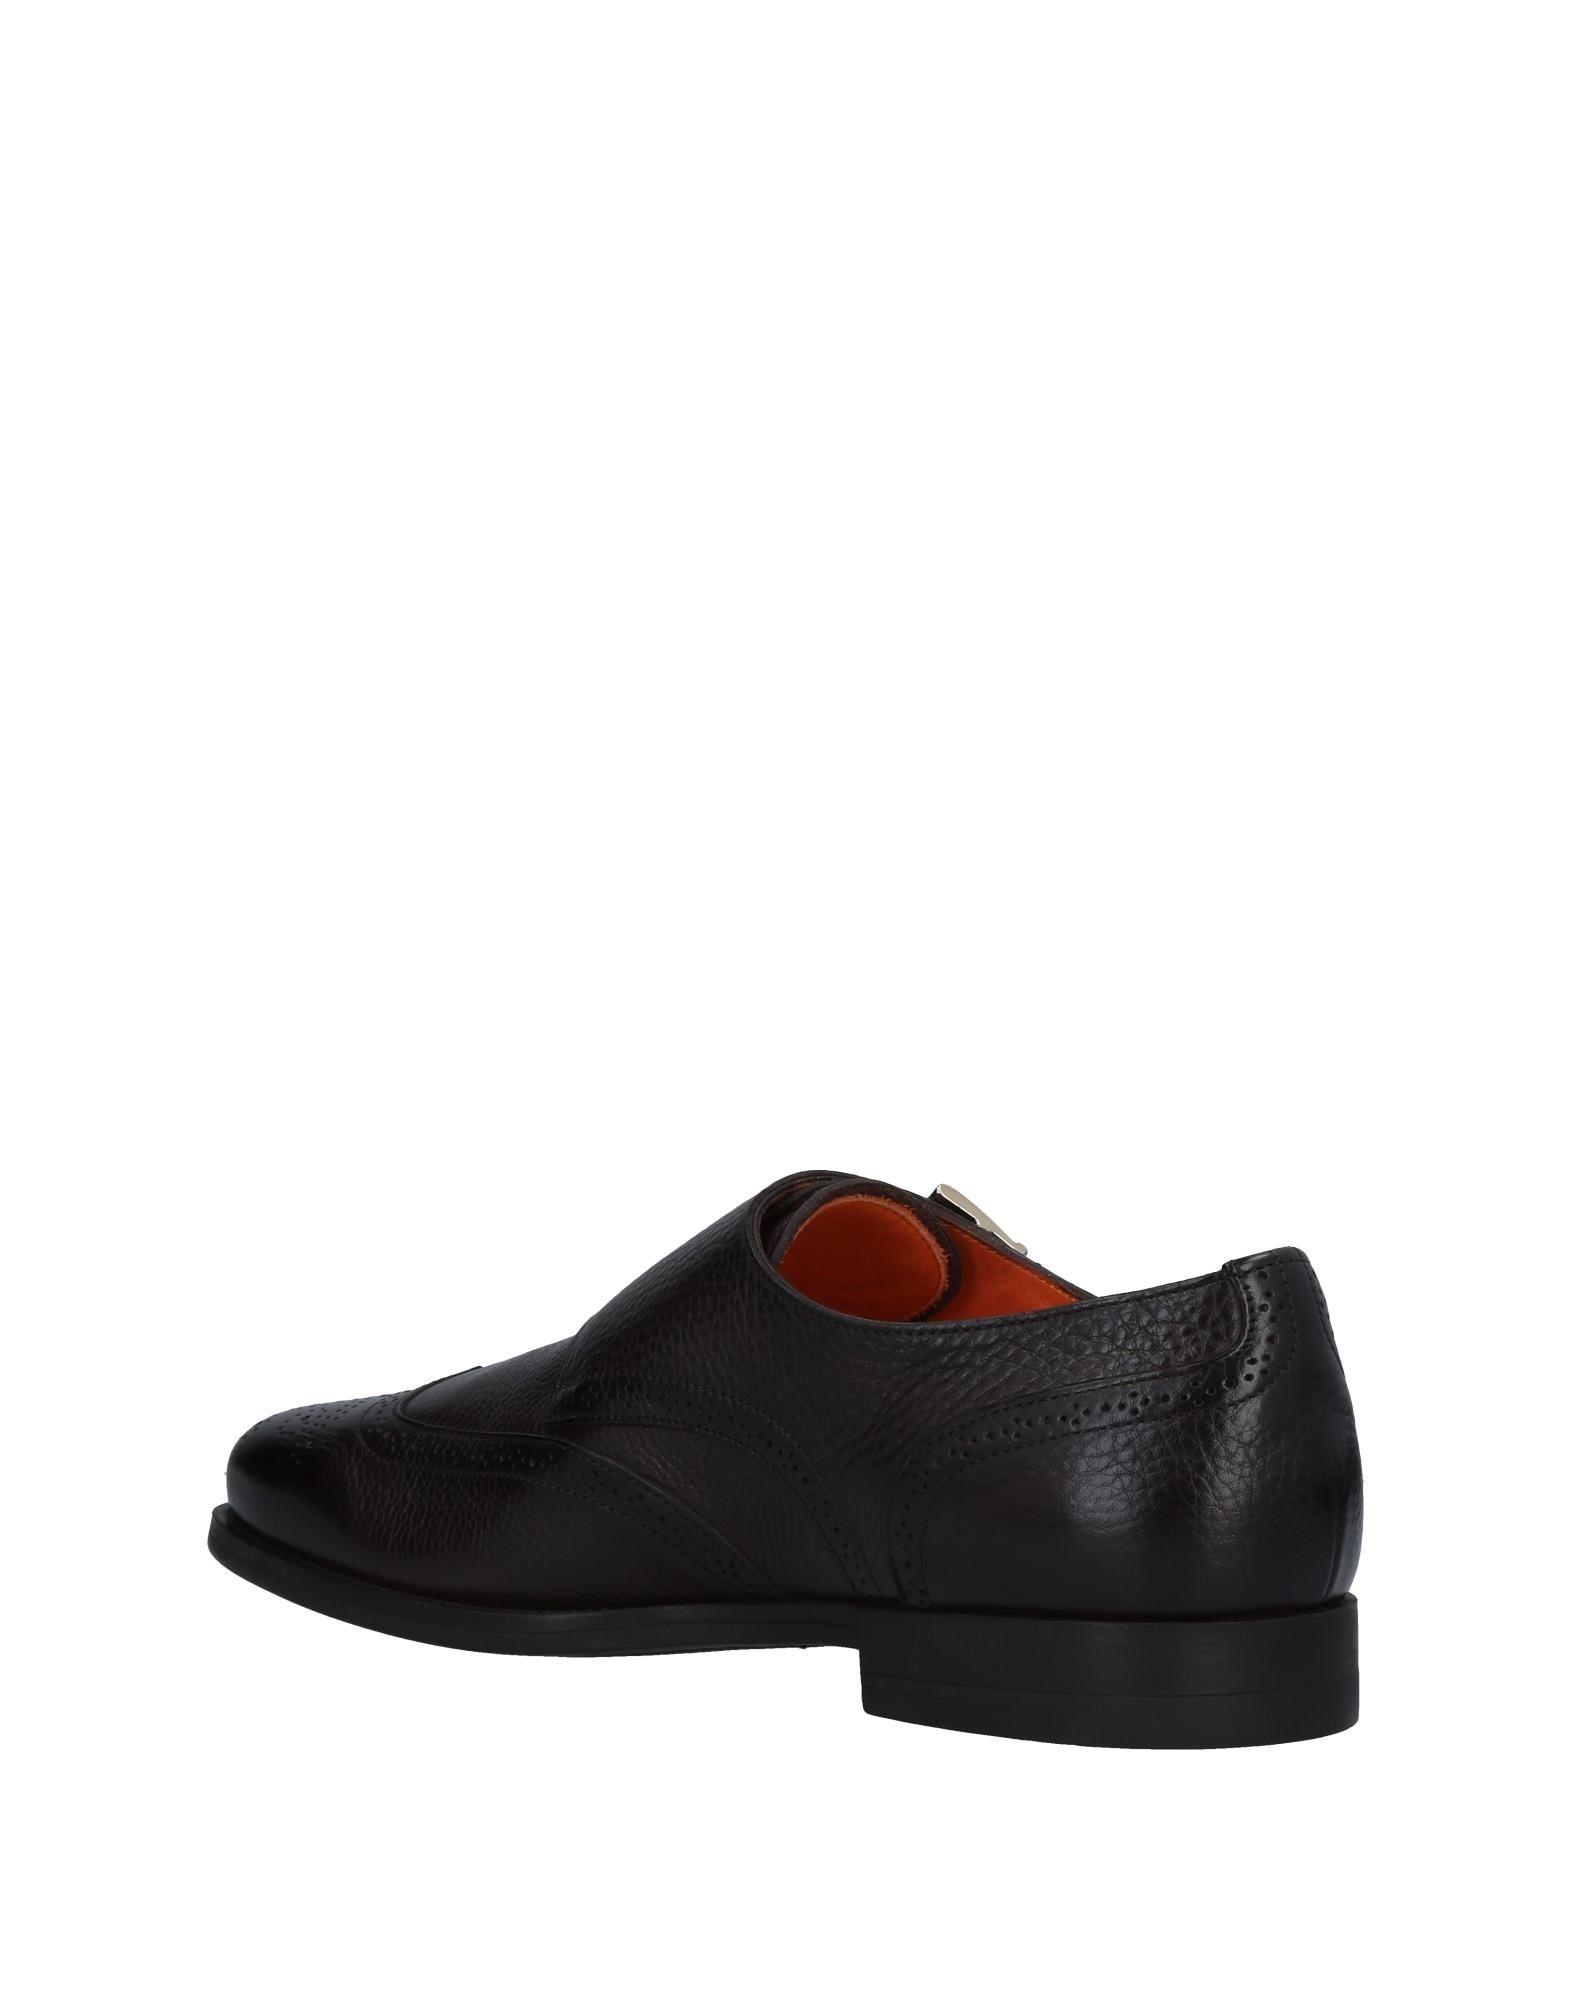 Santoni Mokassins Herren  11478797DR Gute Qualität beliebte Schuhe